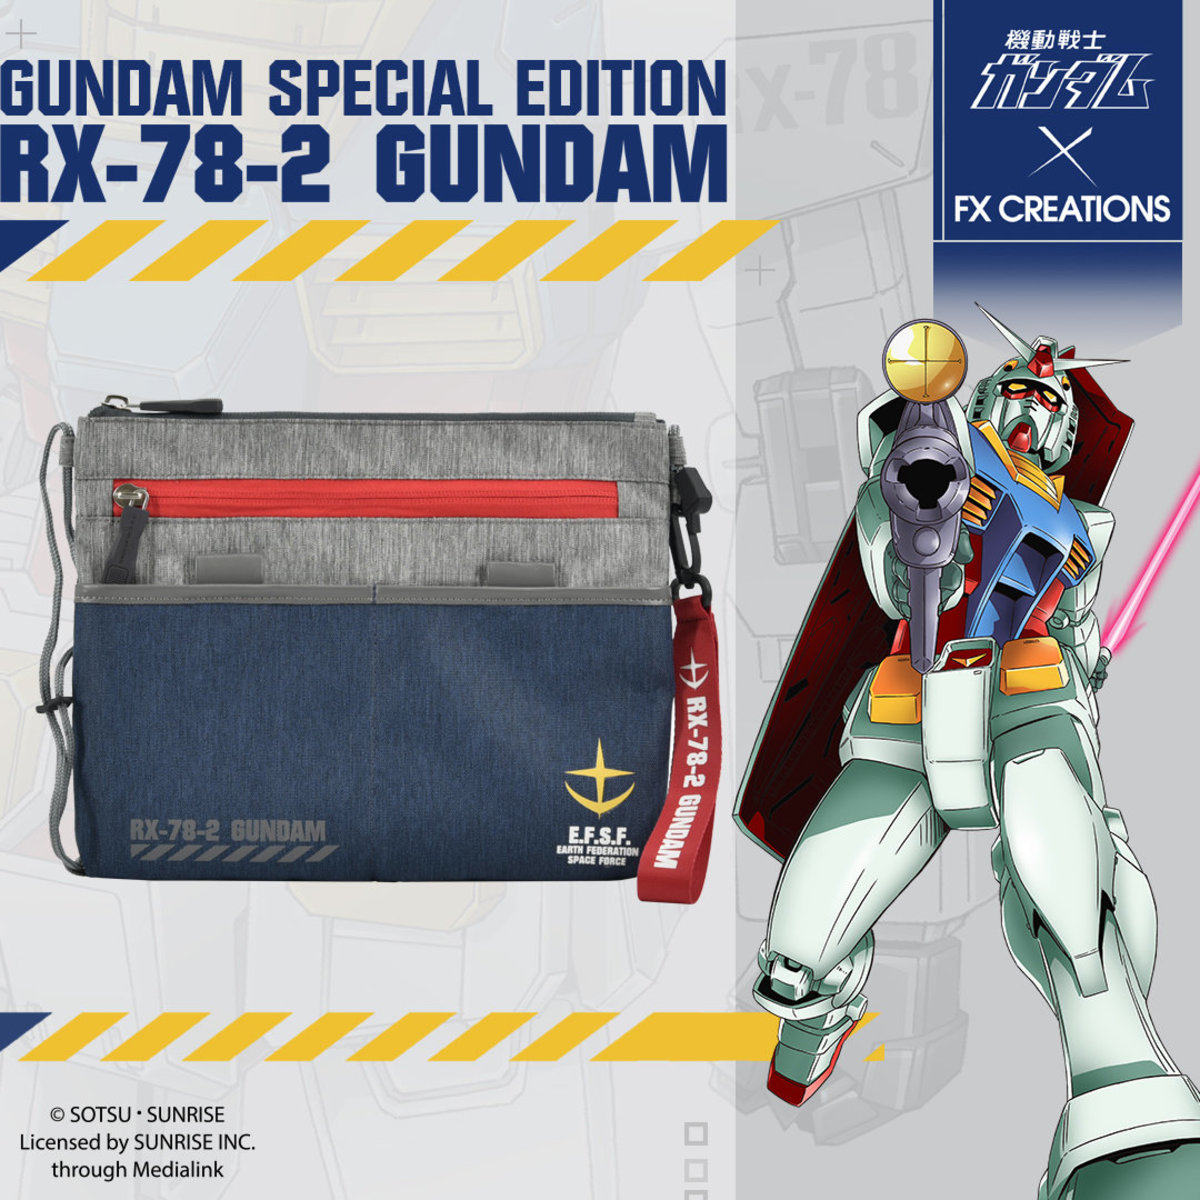 FX Creations x Gundam Special Edition Series - Gundam RX-78-2 Crossbody